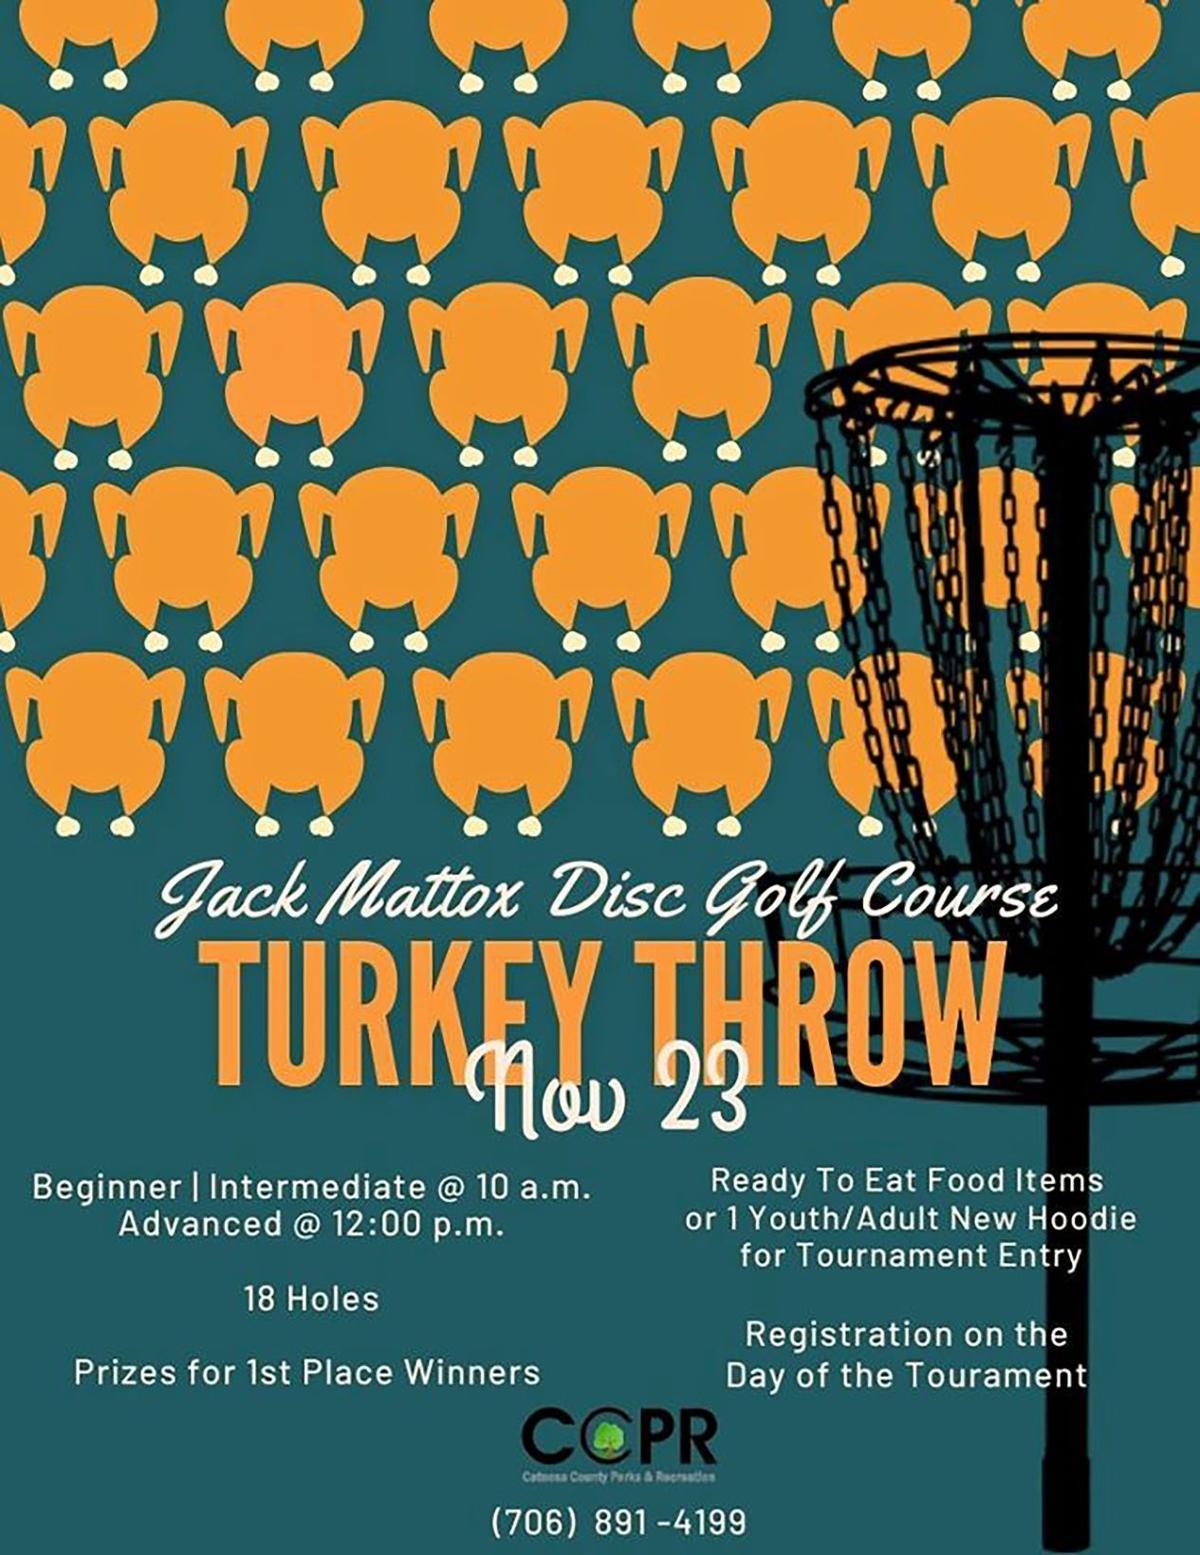 Catoosa Turkey Throw